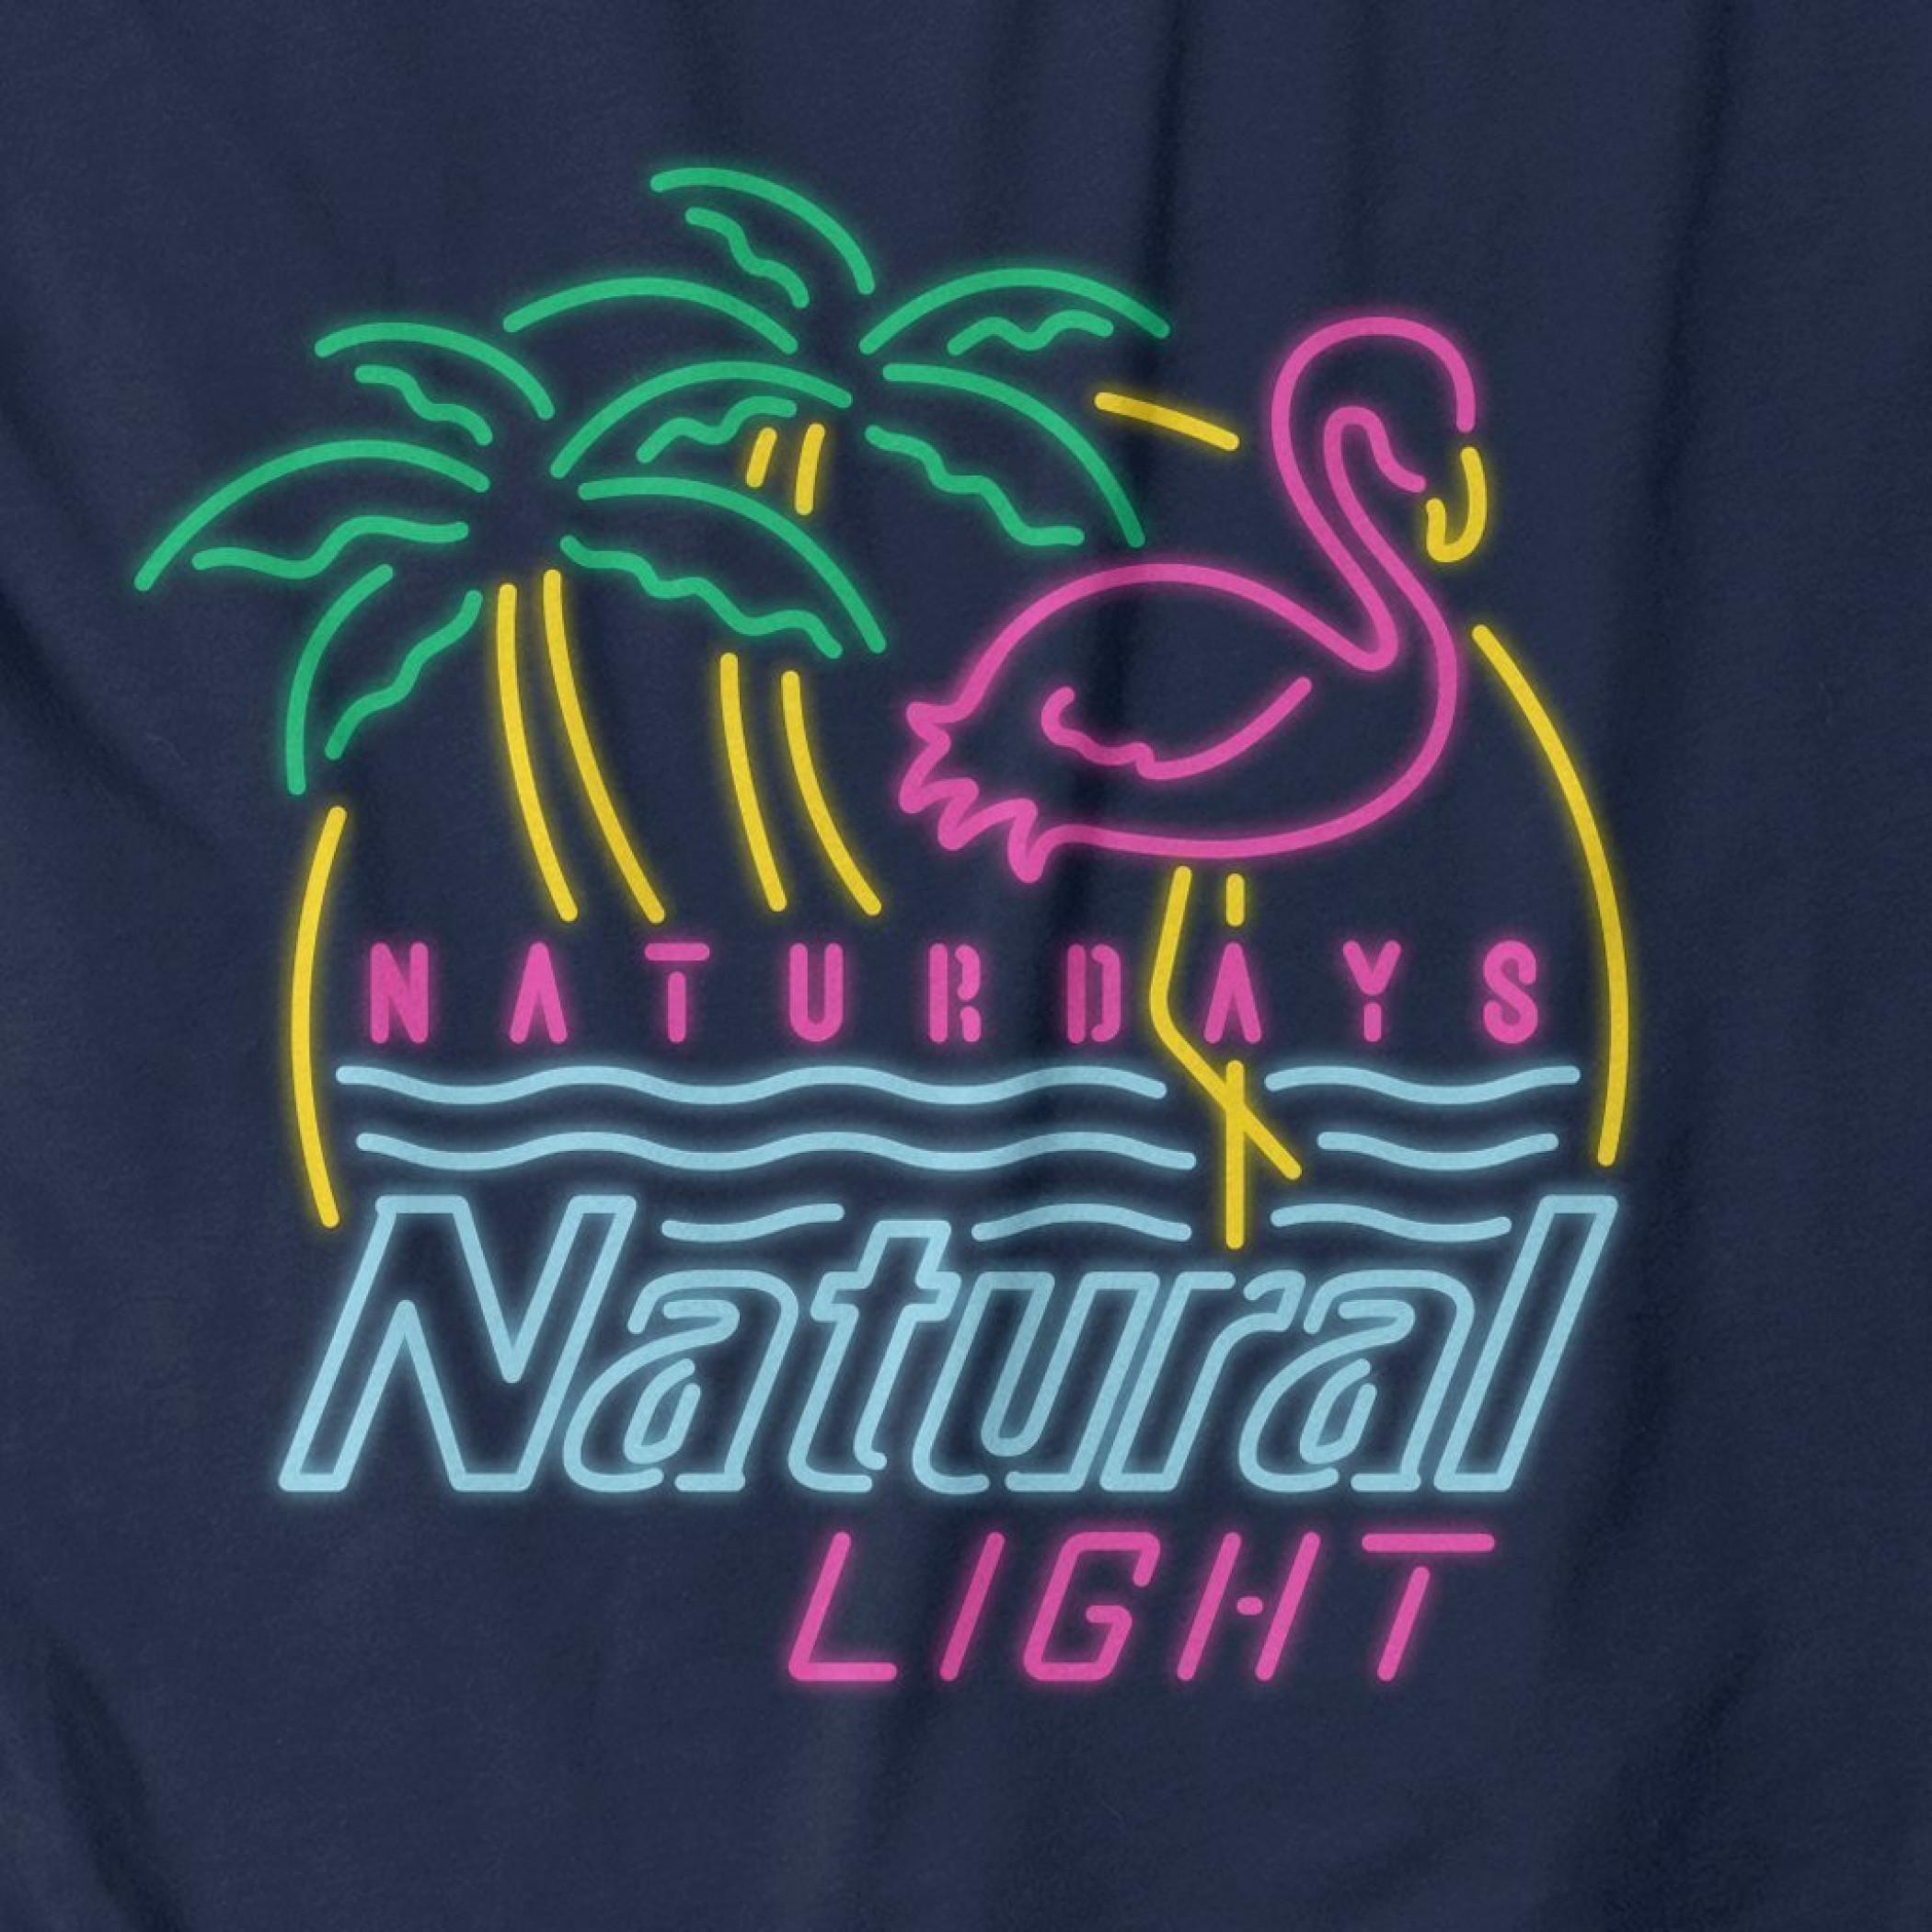 Natural Light Beer Naturdays Neon Navy Men's Cotton Tank Top